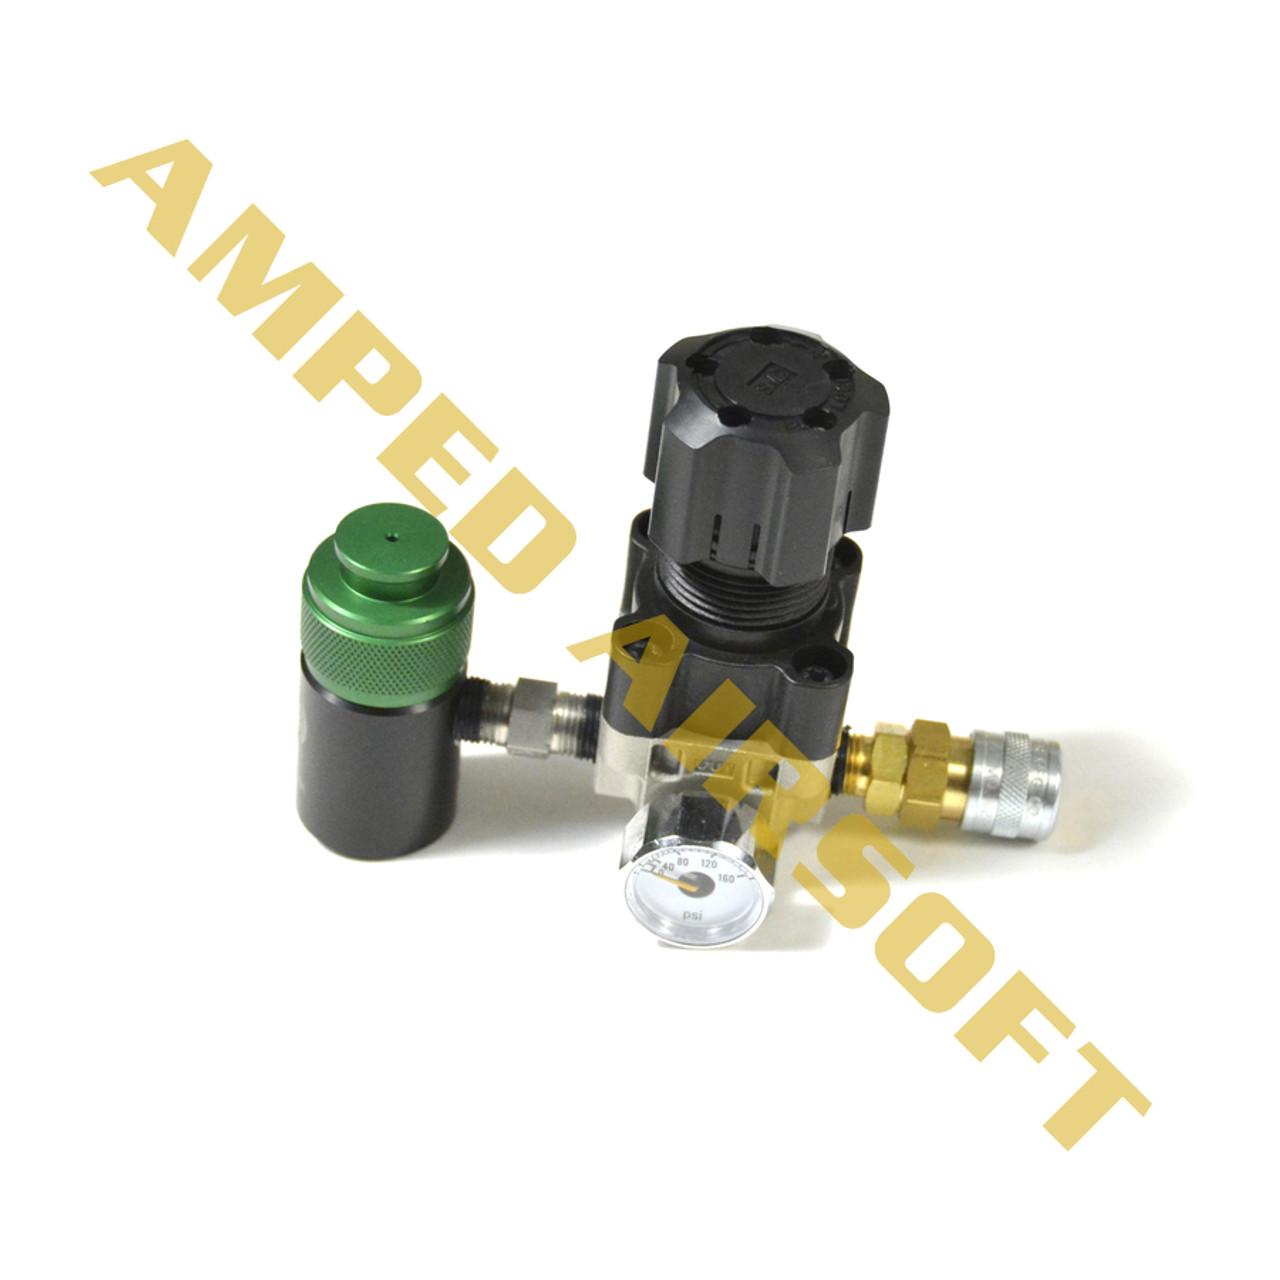 Amped Airsoft HPA SLP Regulator Side shot